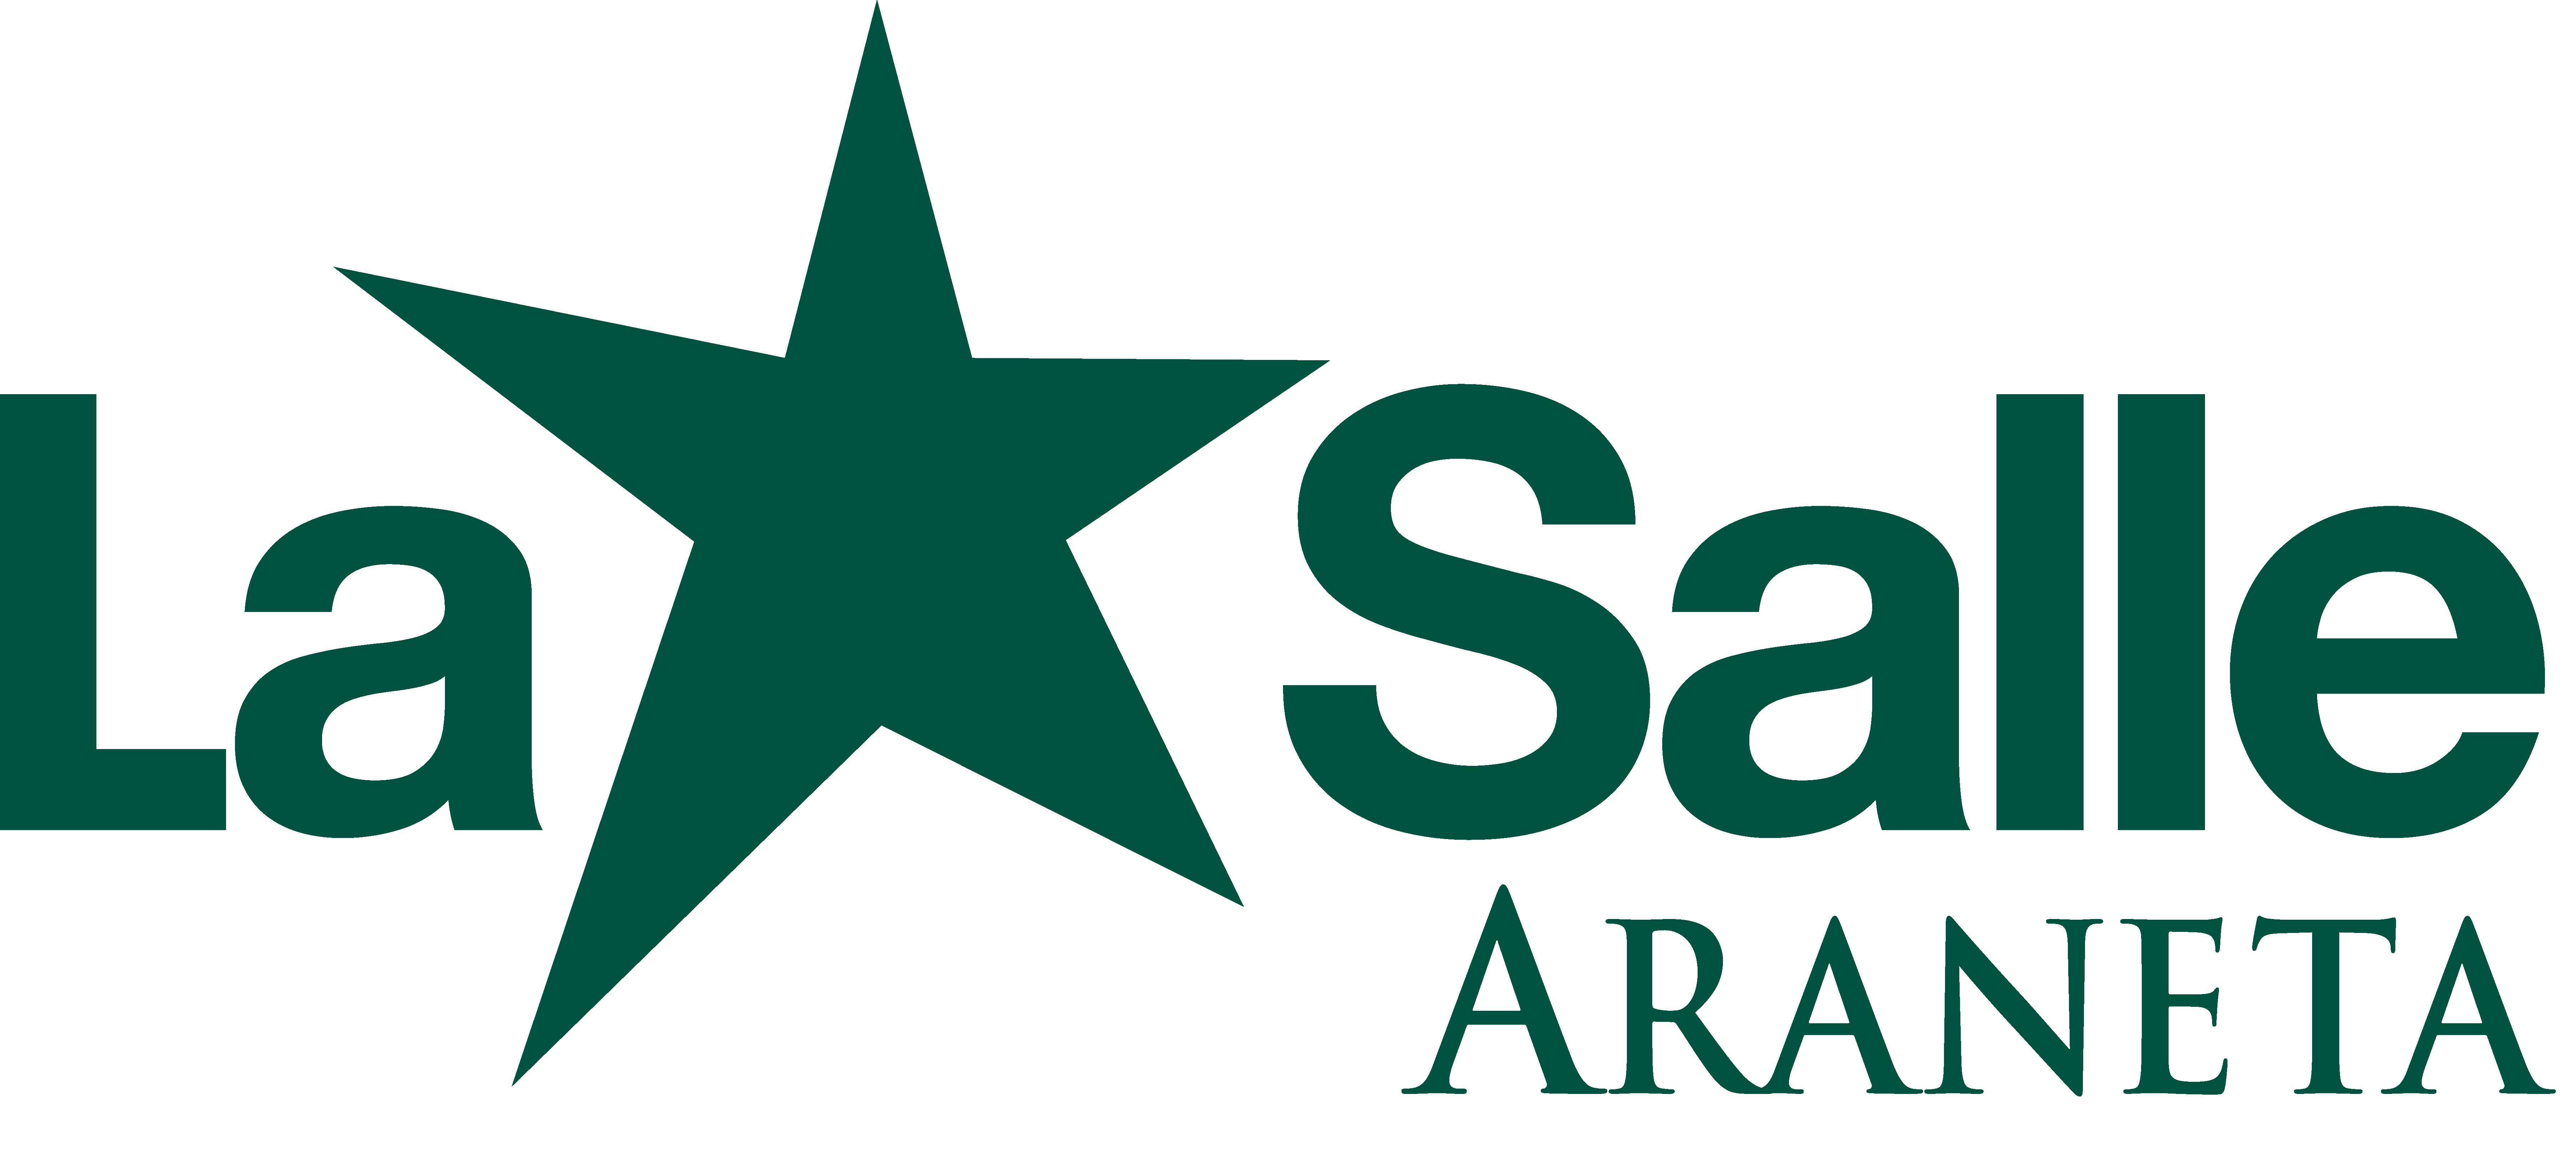 De La Salle Araneta Website